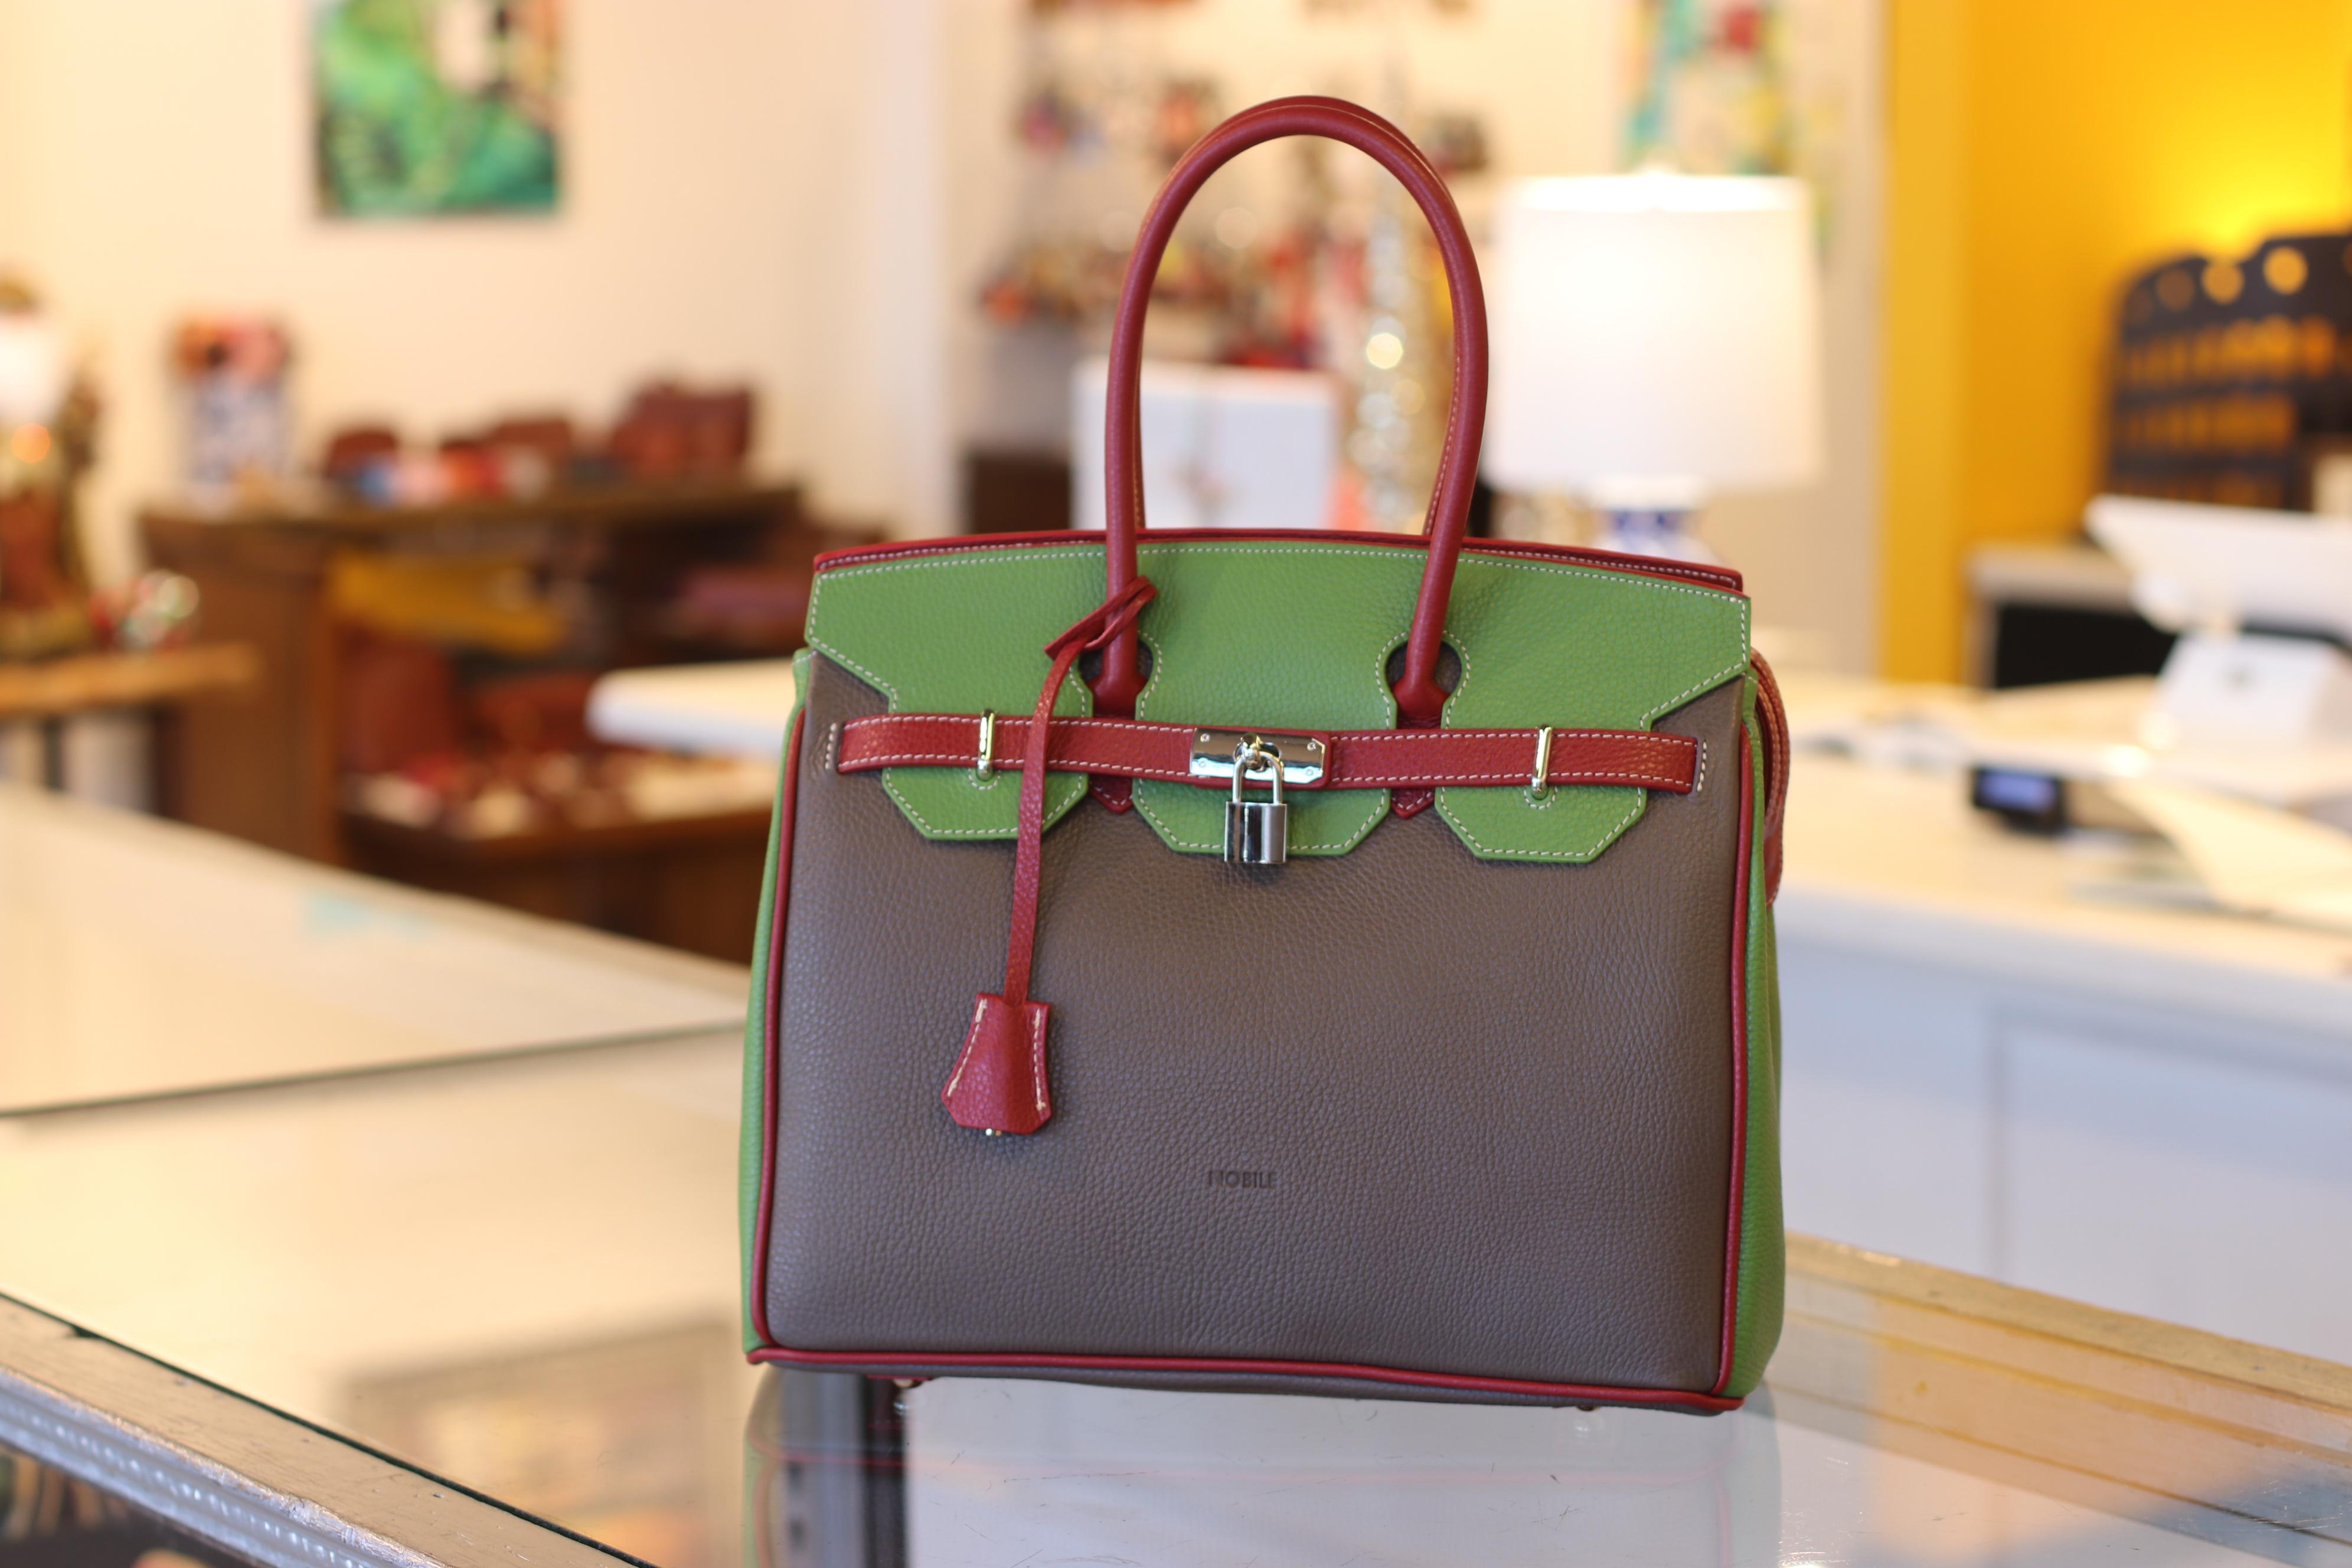 Luca Italian Leather Boutique image 3